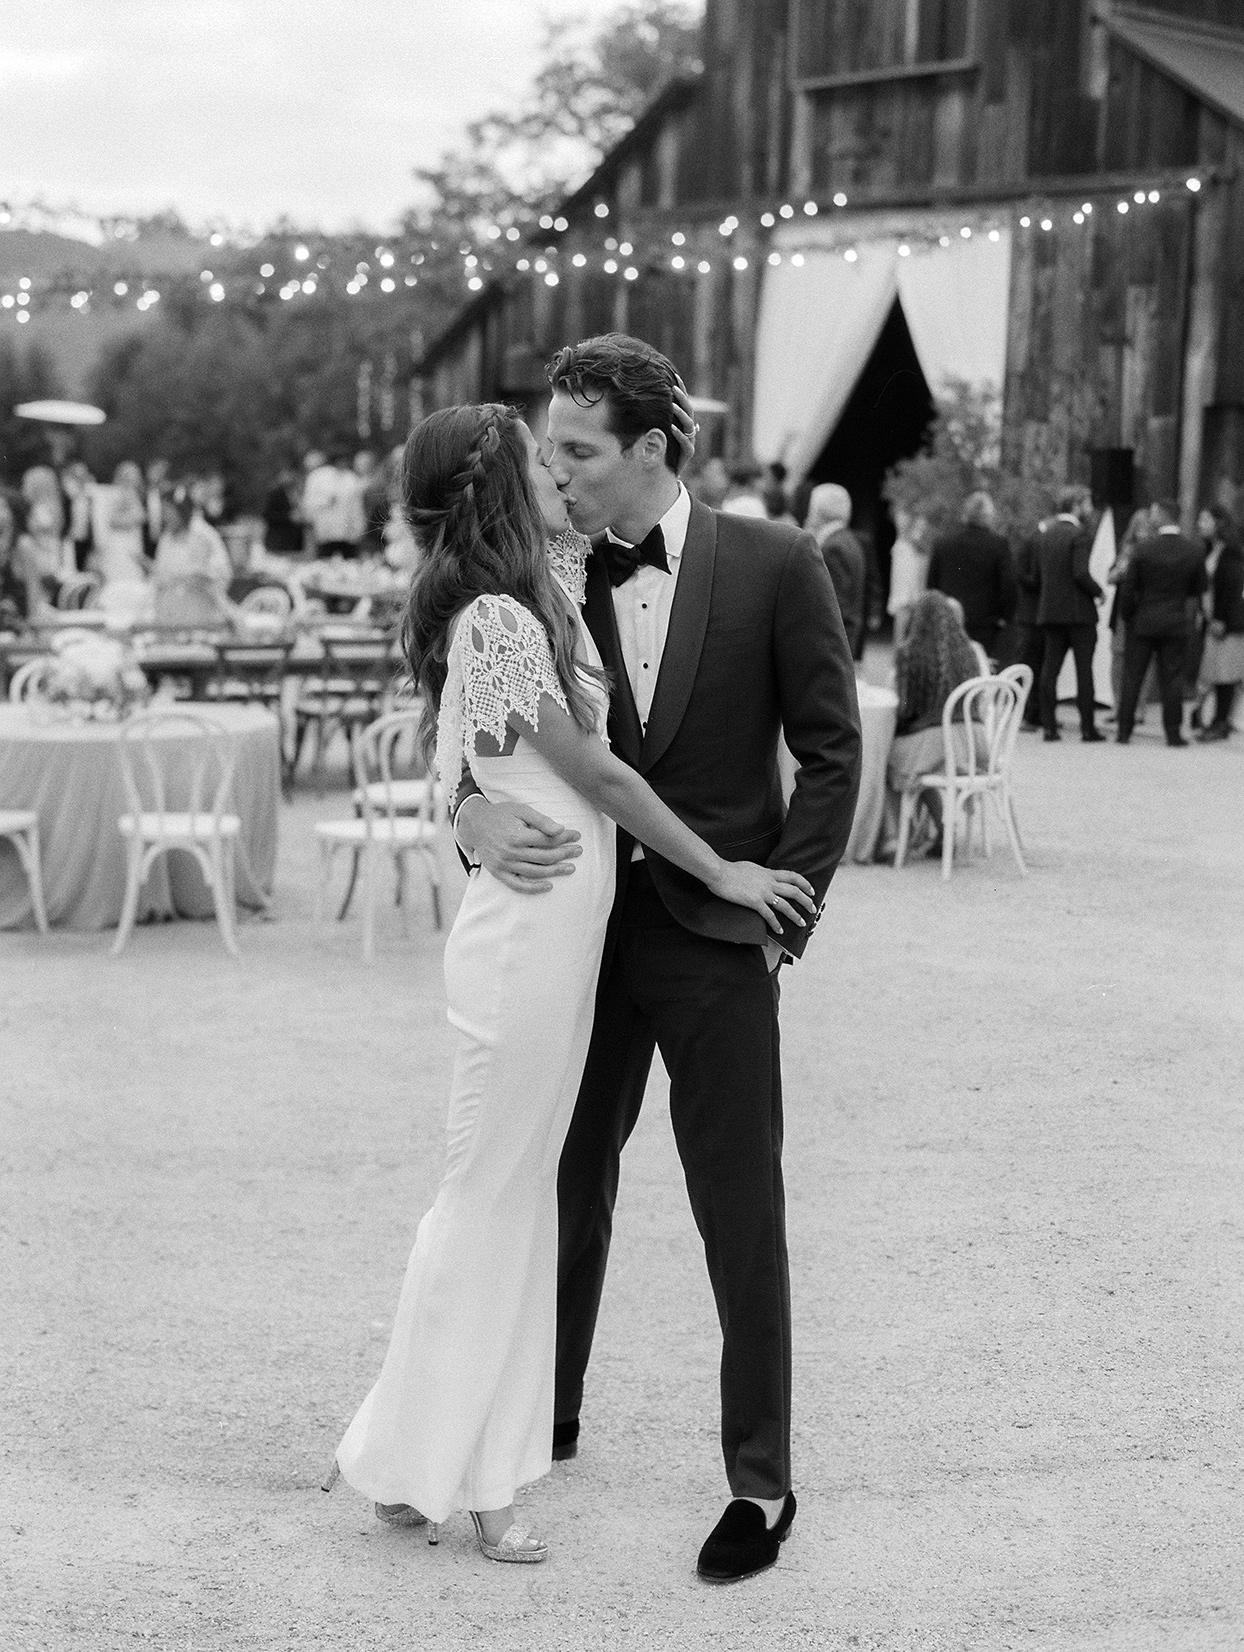 mika steve wedding reception dress couple kissing